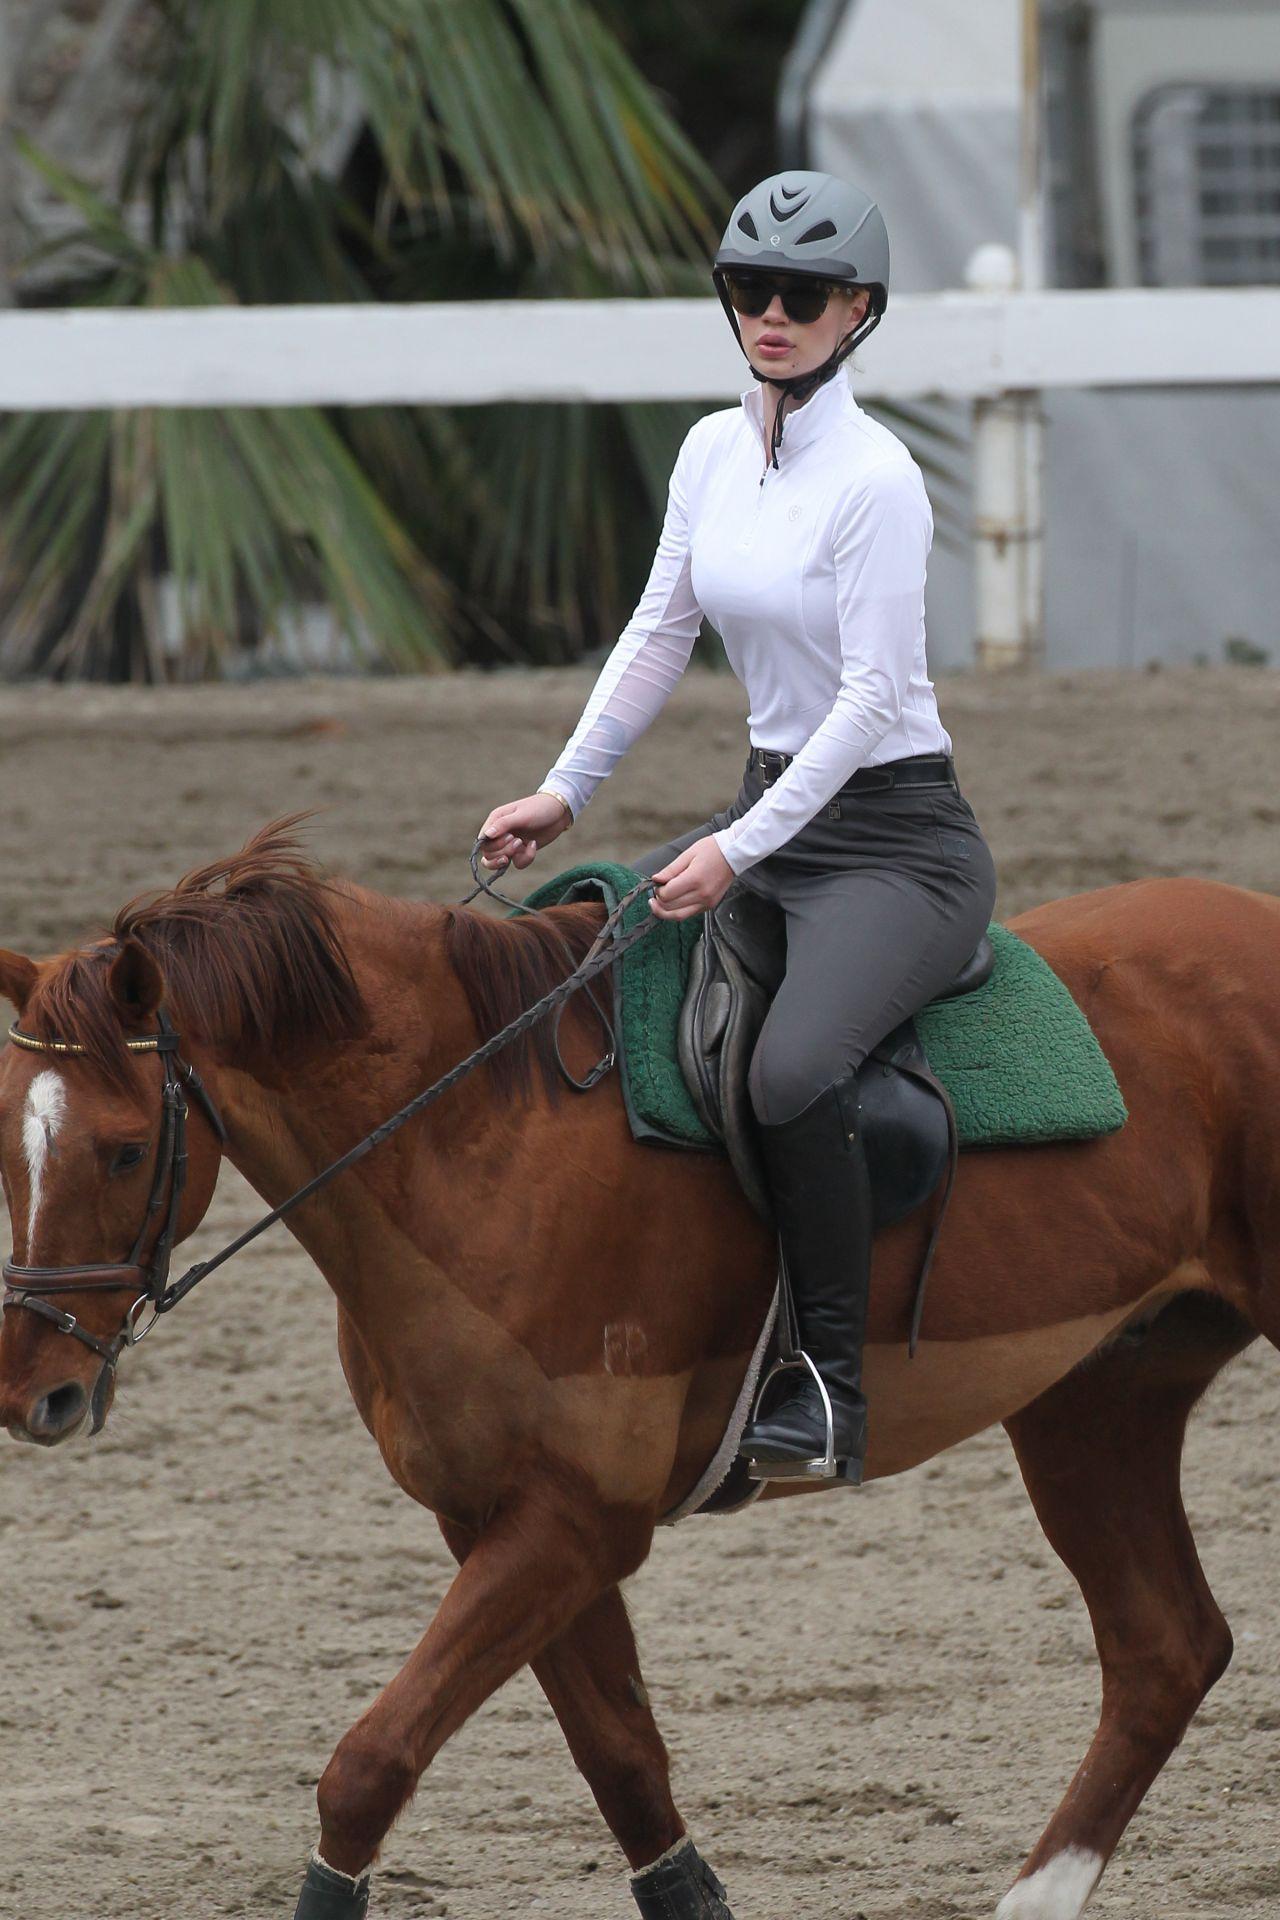 Iggy Azalea - Horseback Riding Lesson in Los Angeles, Feb. 2015